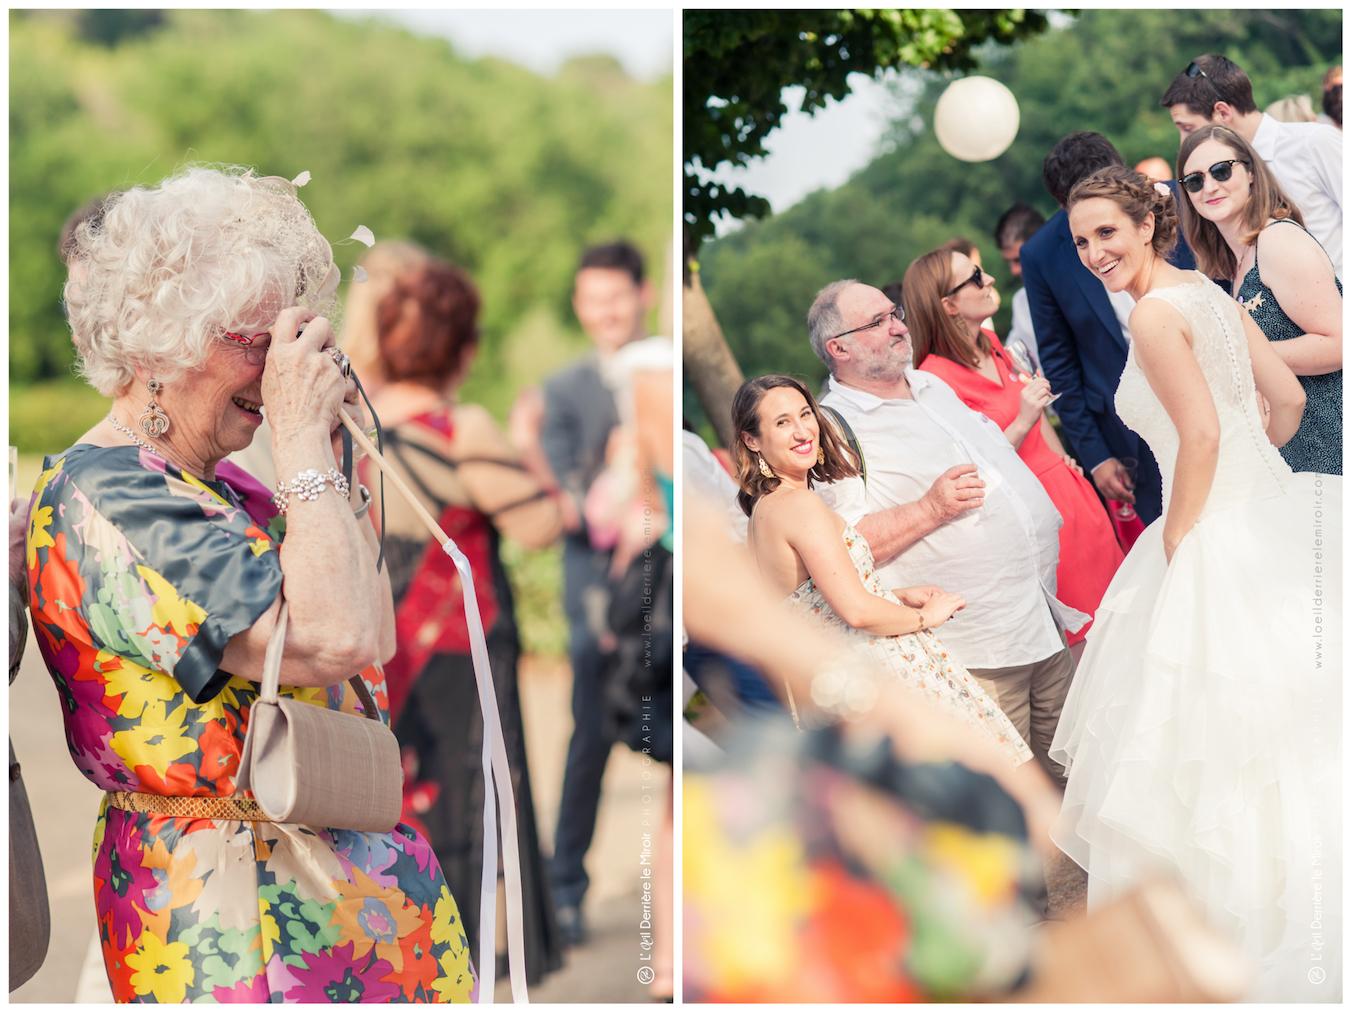 photographe-mariage-06-chateau-vaugrenier-14